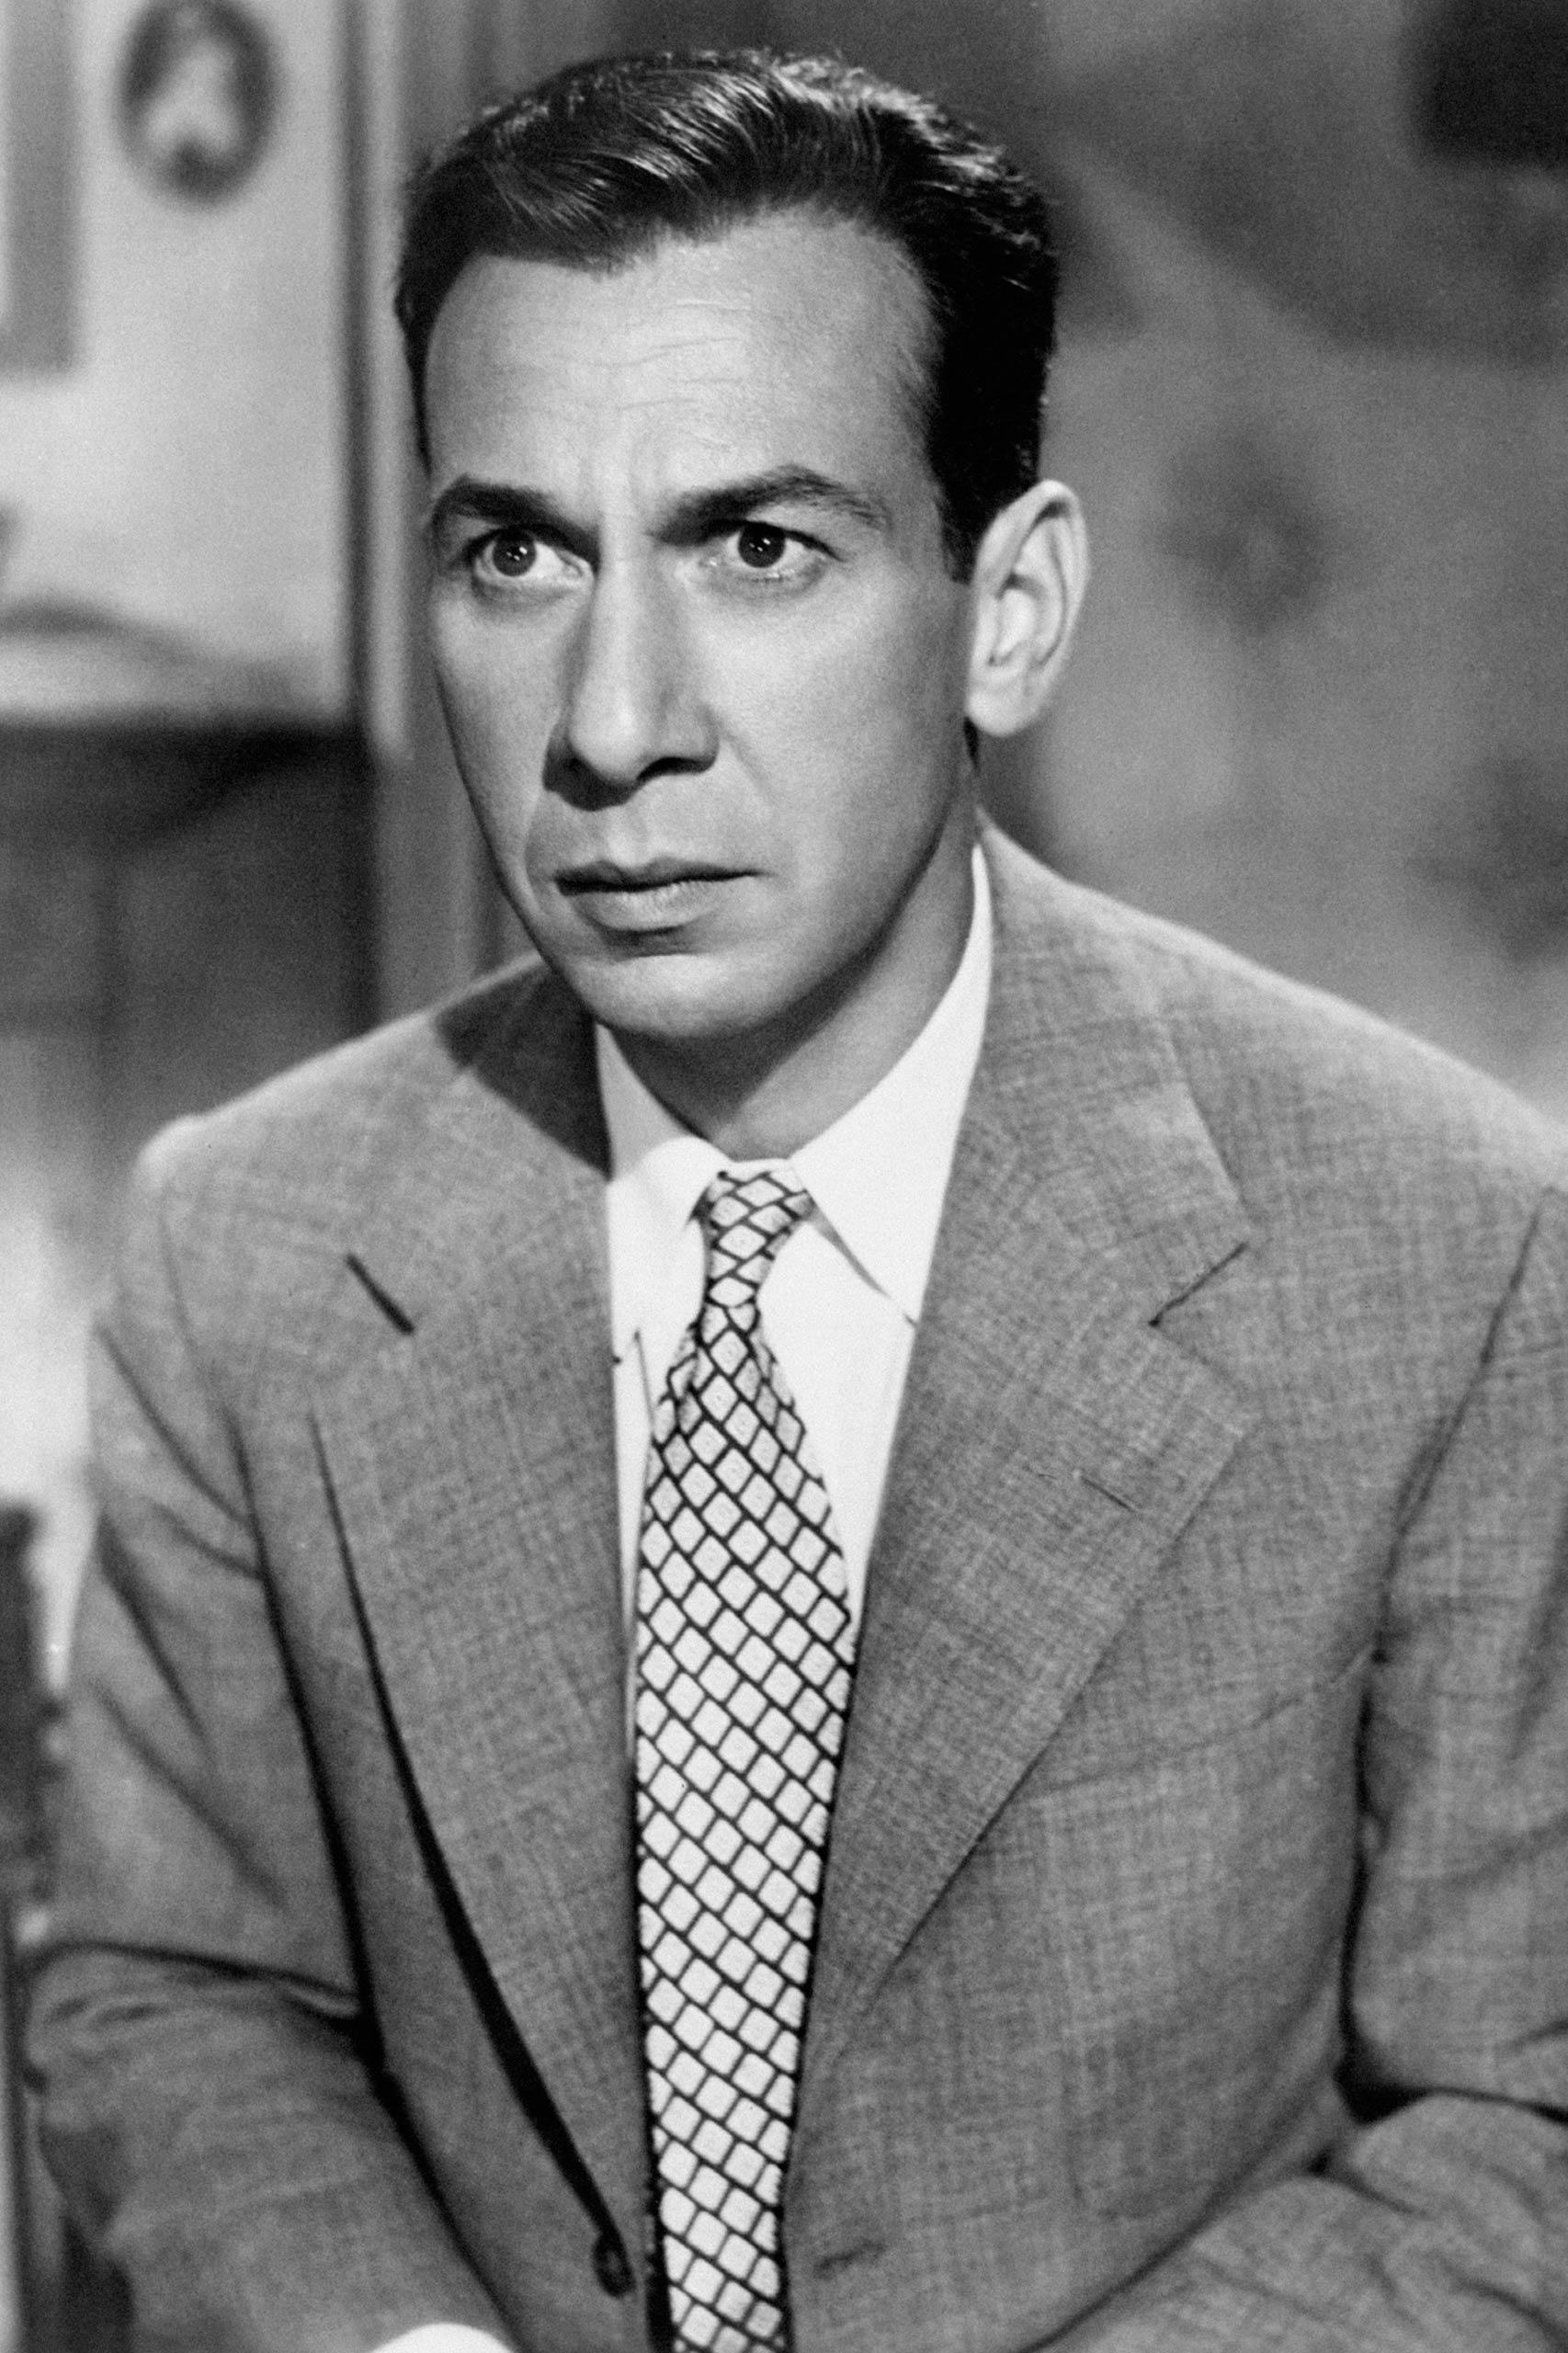 <strong>1951: José Ferrer - <i>Cyrano de Bergerac</i></strong>